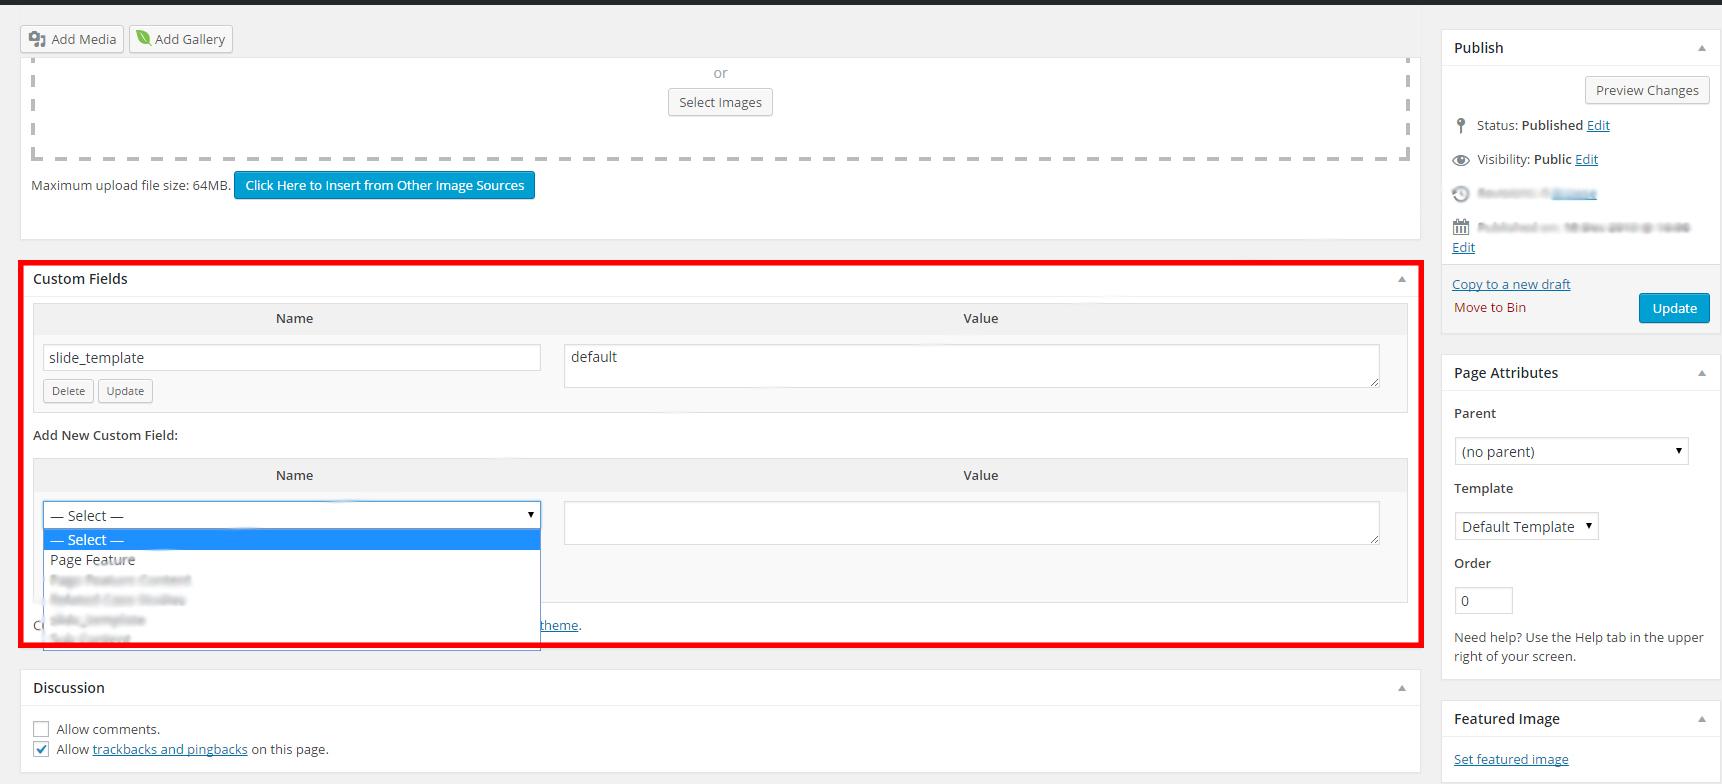 Custom Fields Screenshot 1